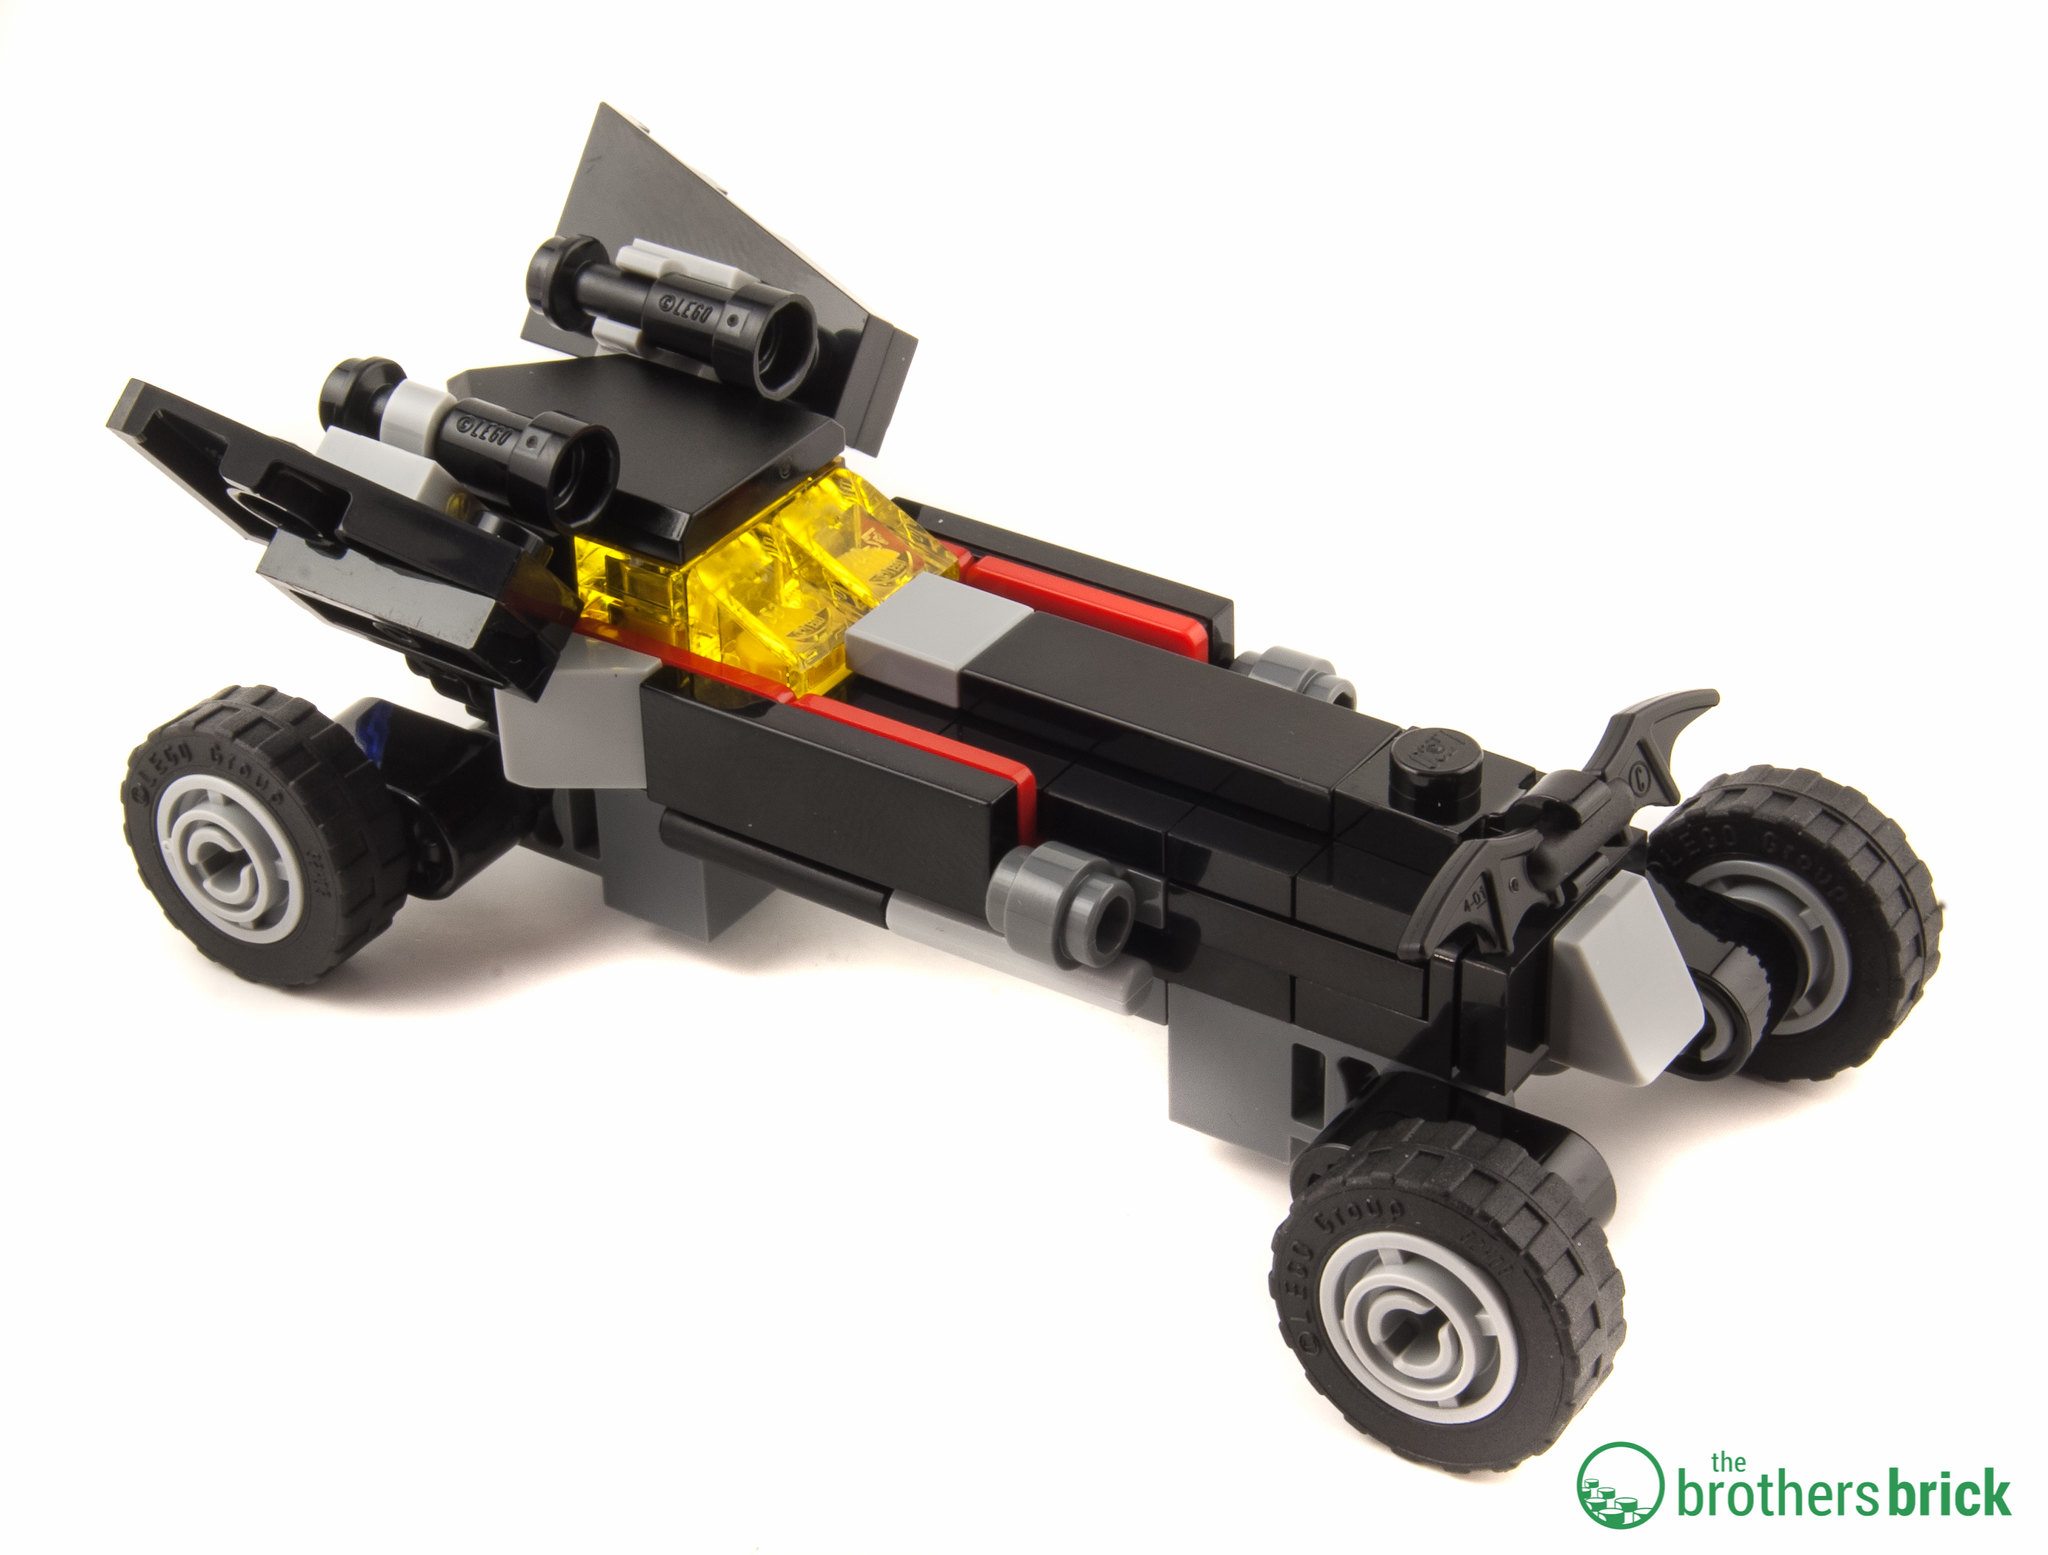 New LEGO Batman Movie Batmobile Batwing Mini Sets